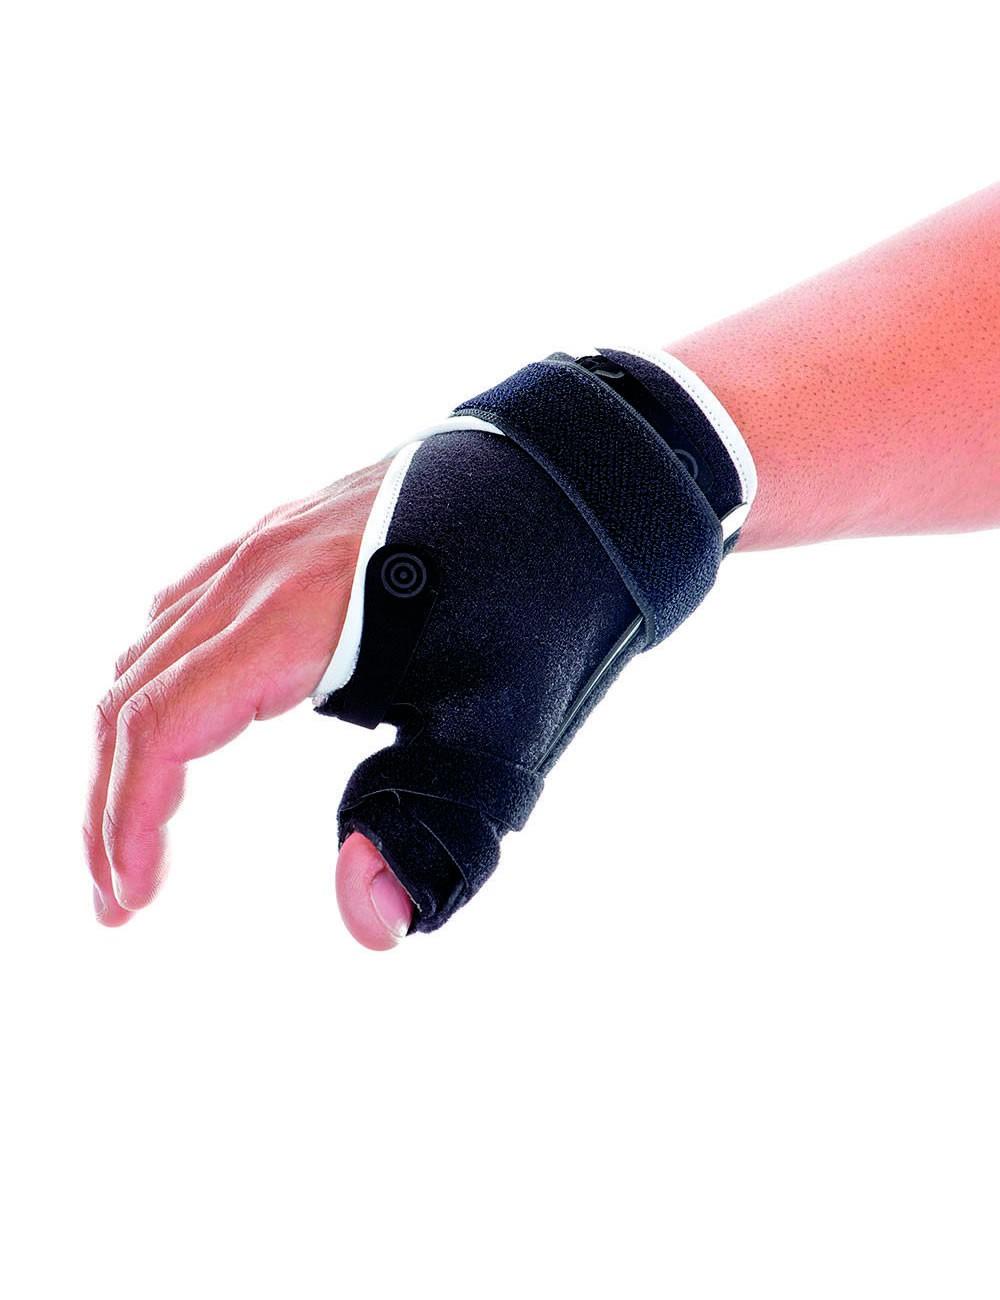 PK09 - Wrist brace 1st ray total control